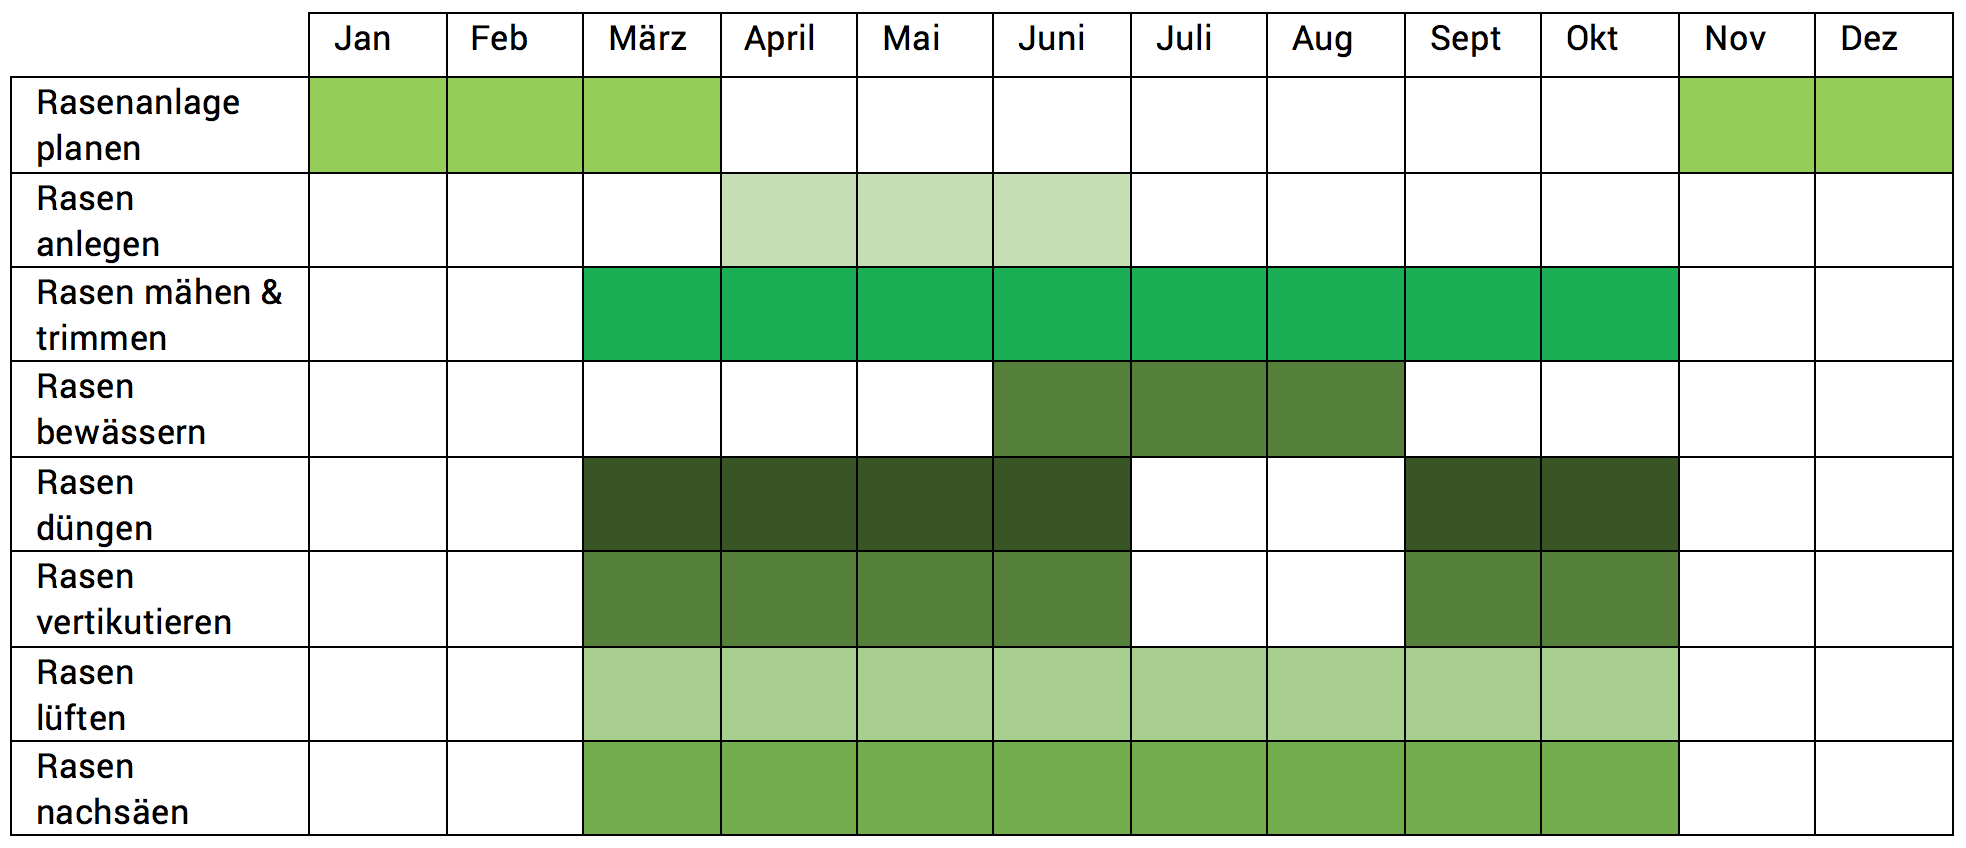 TraumRasen Rasenpflege_Kalender